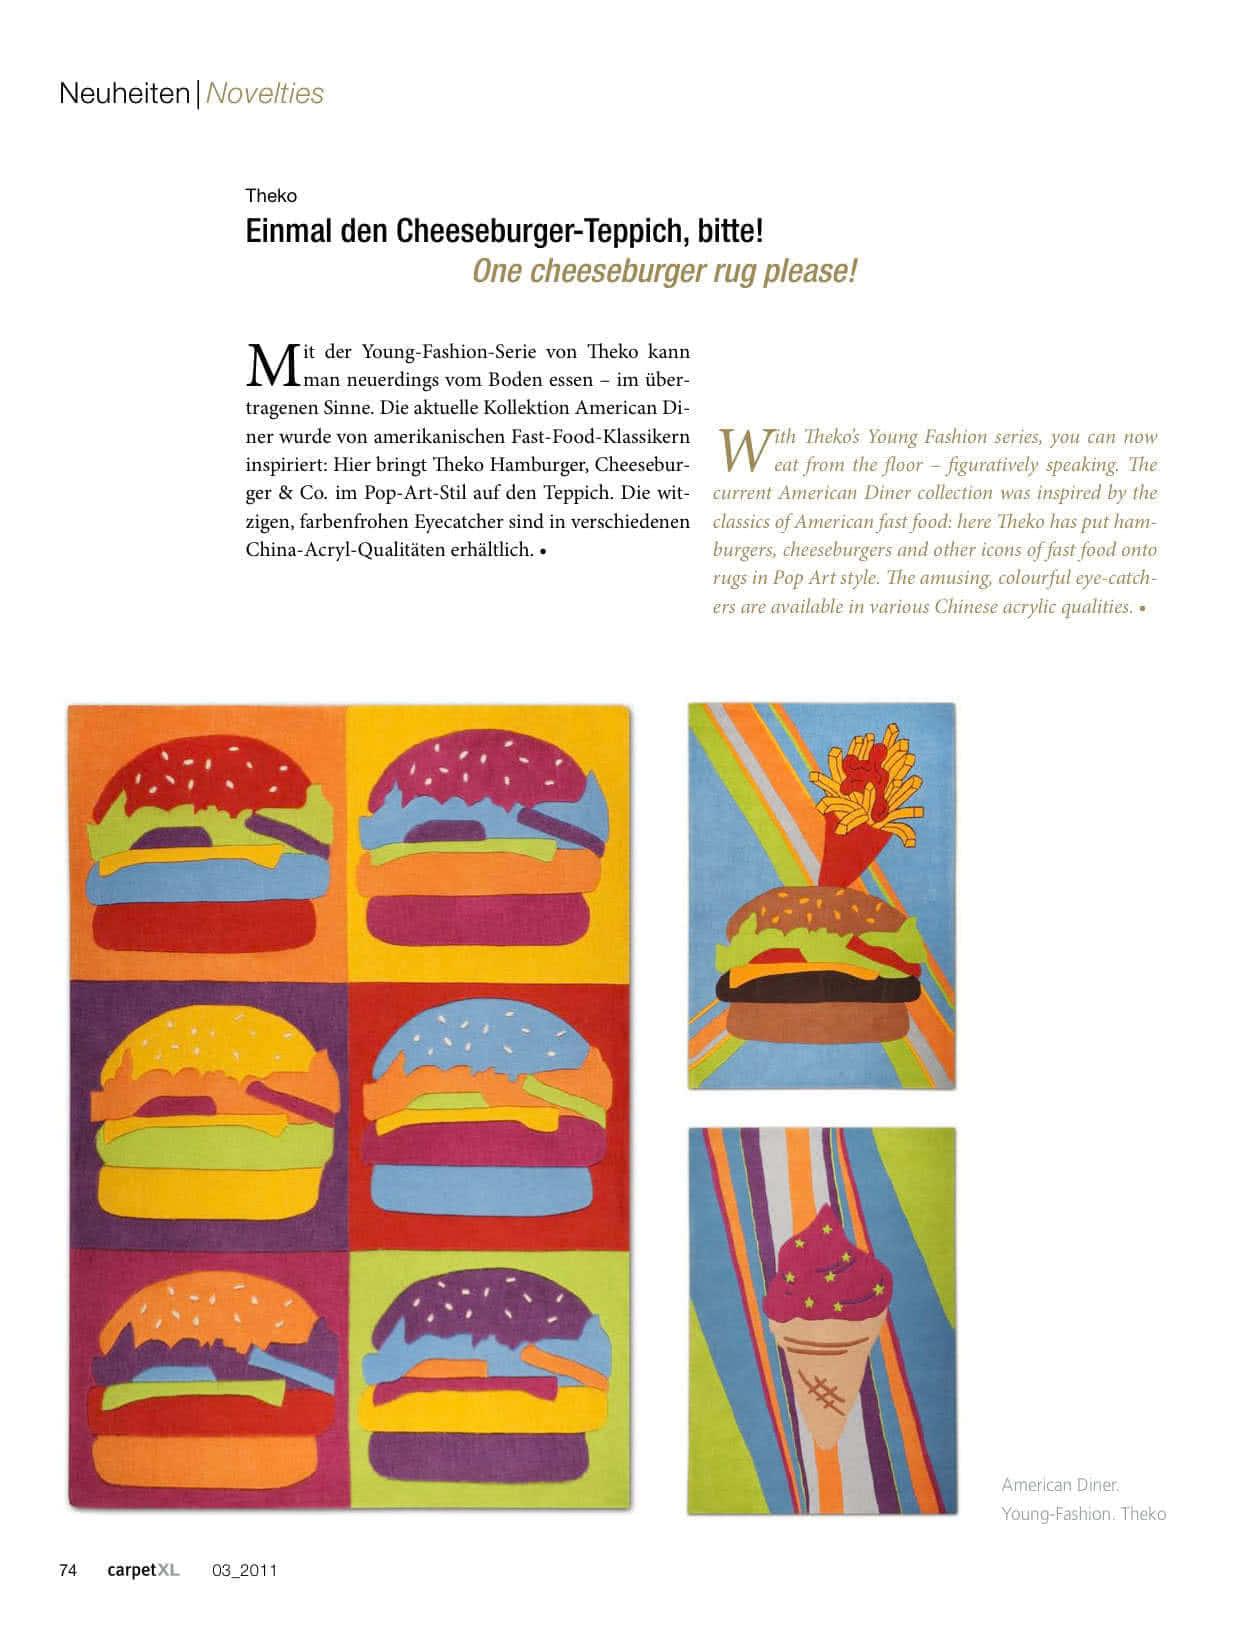 Einmal den Cheesburger-Teppich, Bitte!